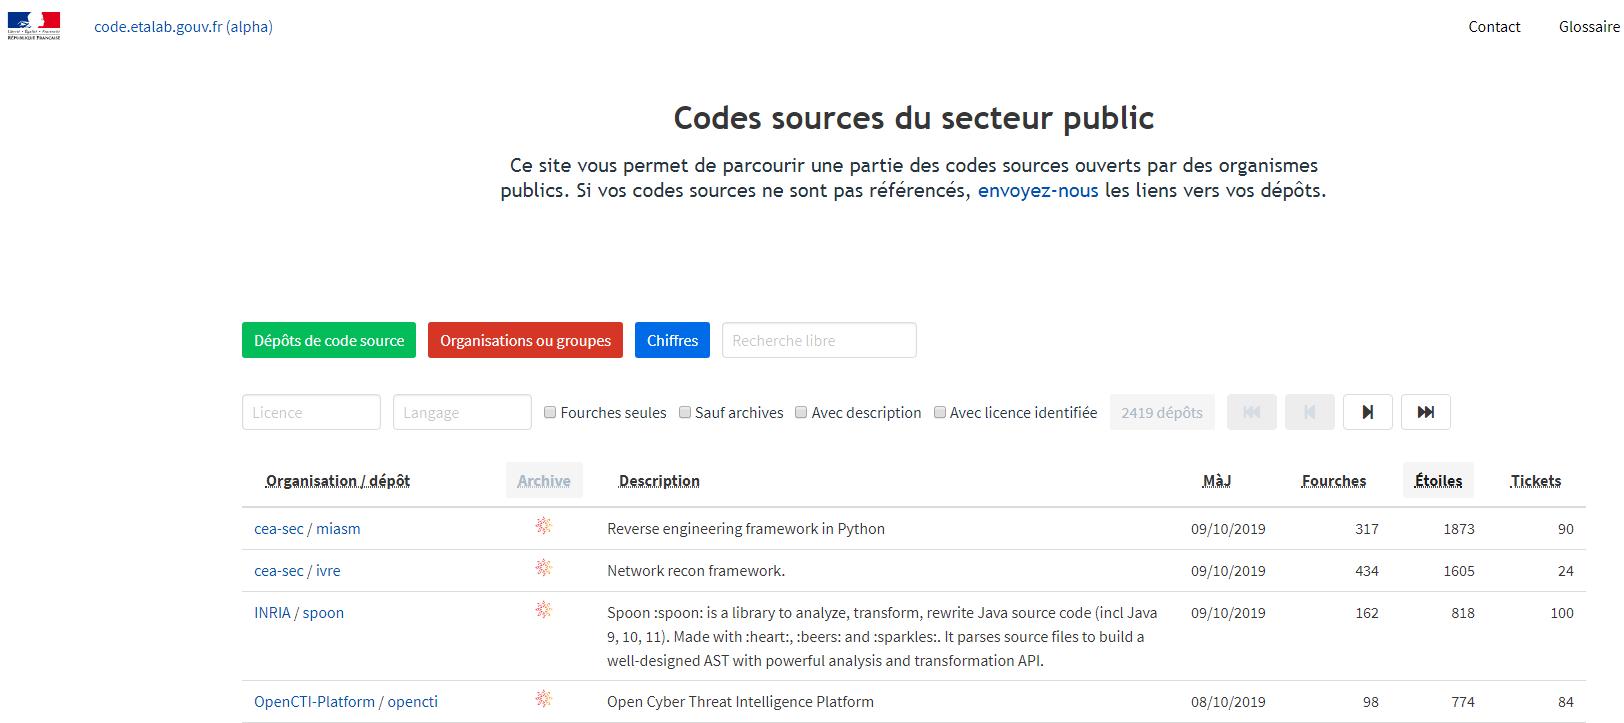 code-etalab-gouv-fr